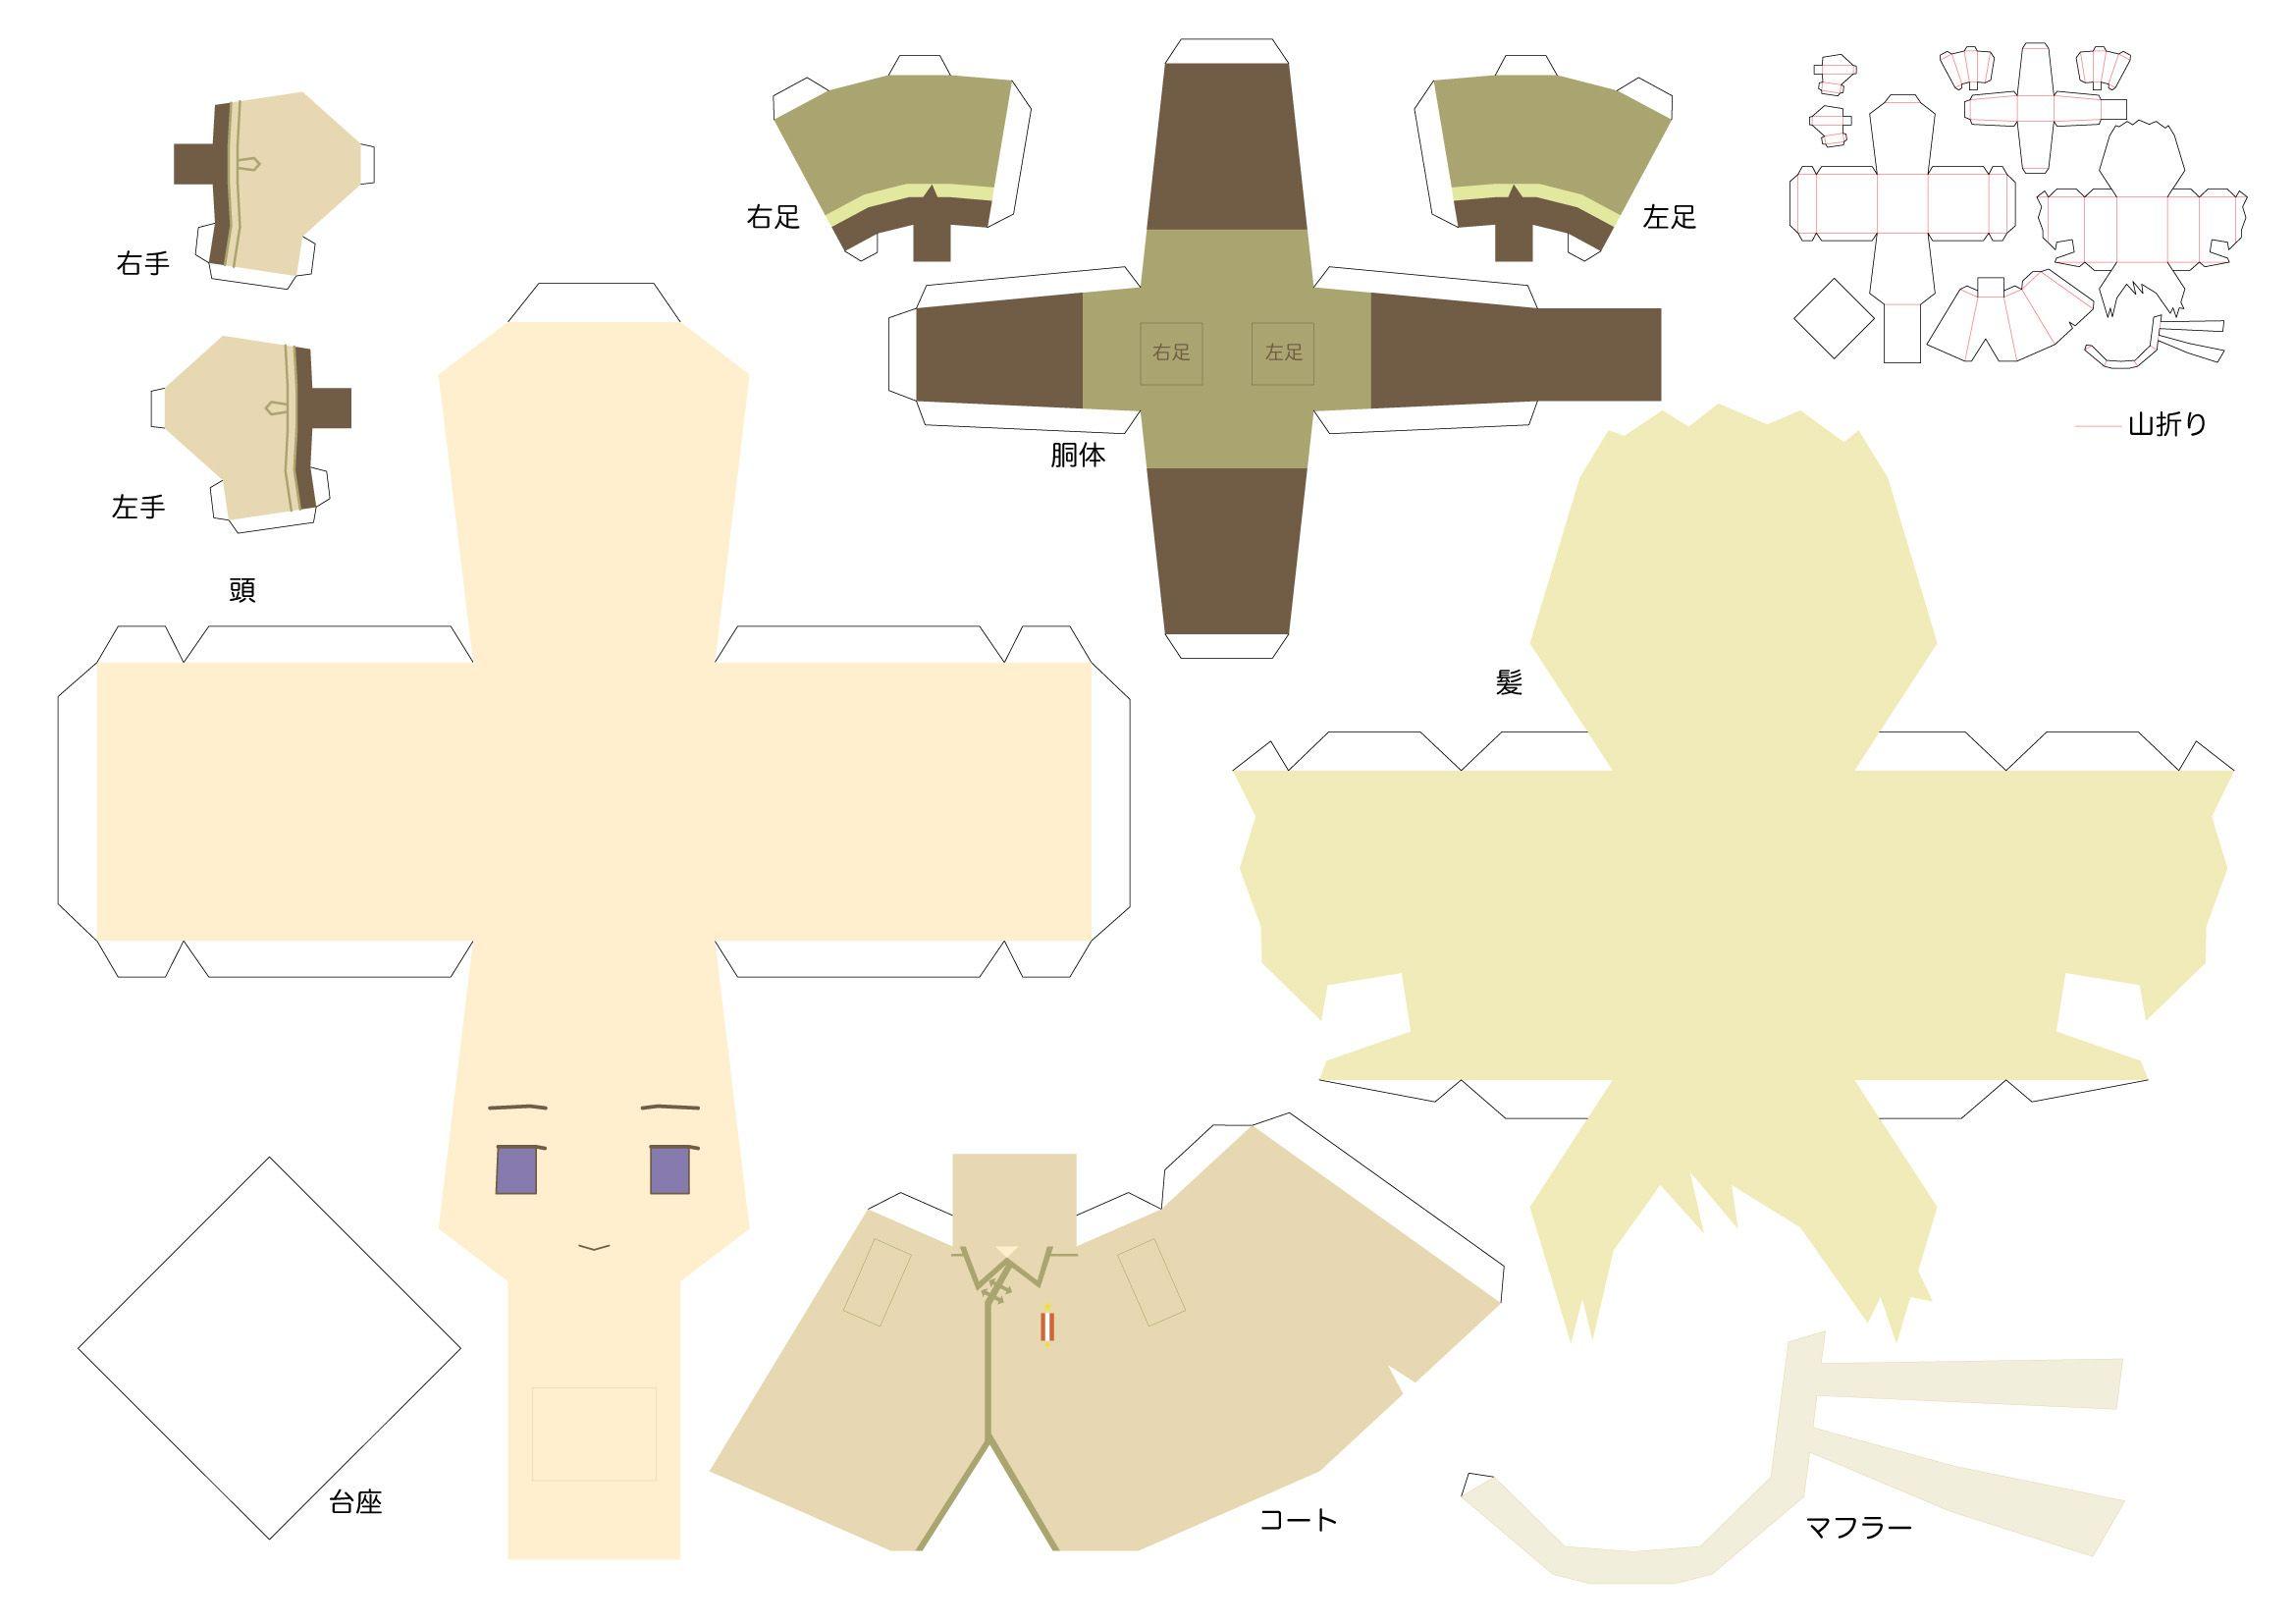 Hetalia Russia Ivan Braginski Hetalia Paperdolls Free Printable Hetalia Dolls For Fans Of